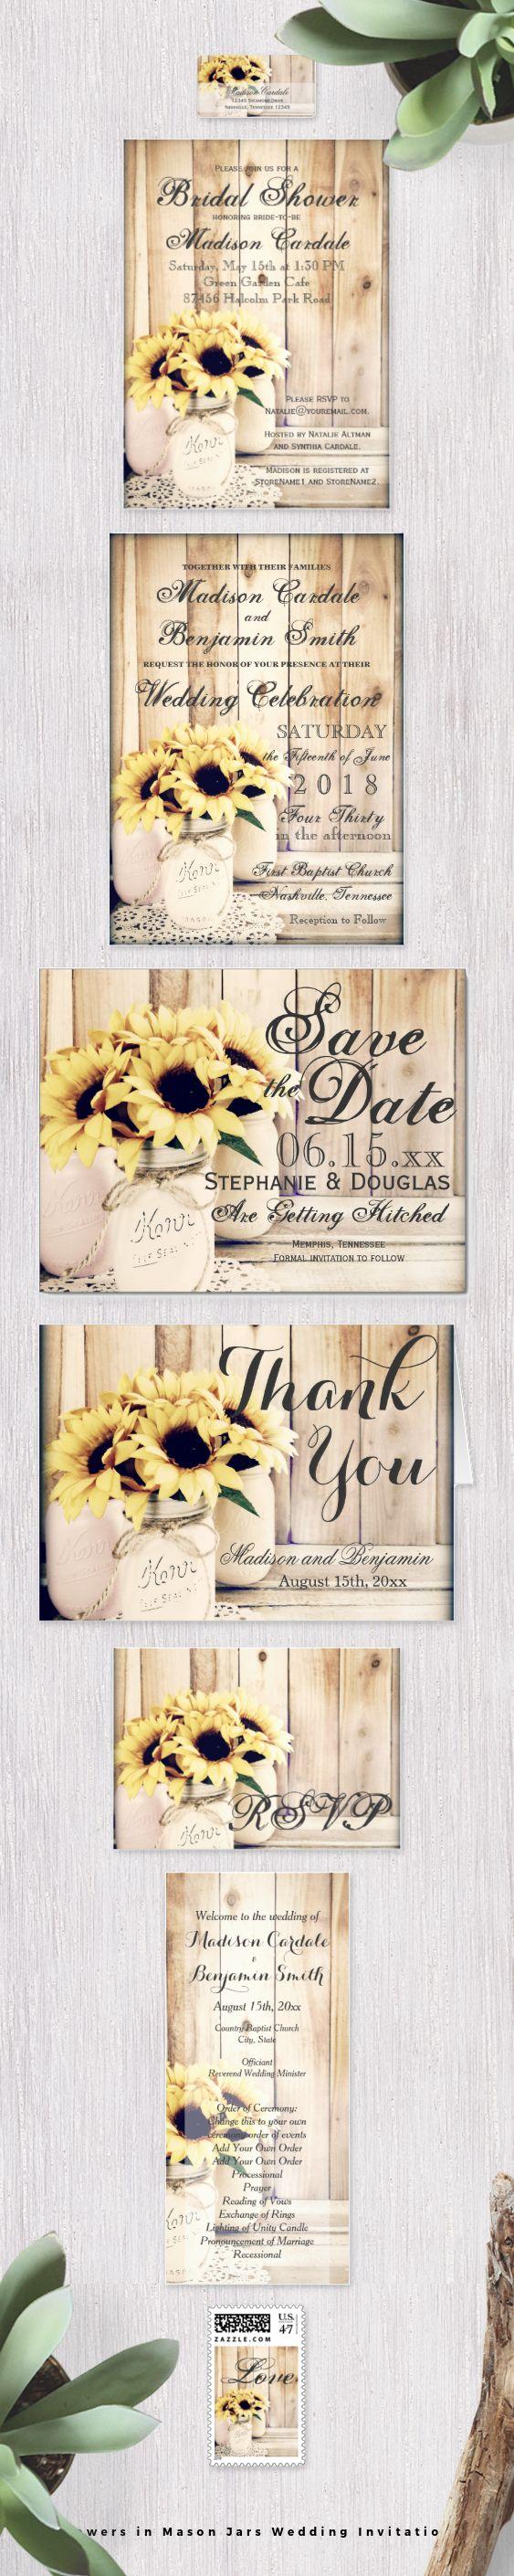 mason jar wedding invitations mason jar wedding invitations Sunflowers in Mason Jars Wedding Invitation Set with bouquets of sunflowers in painted mason jars on